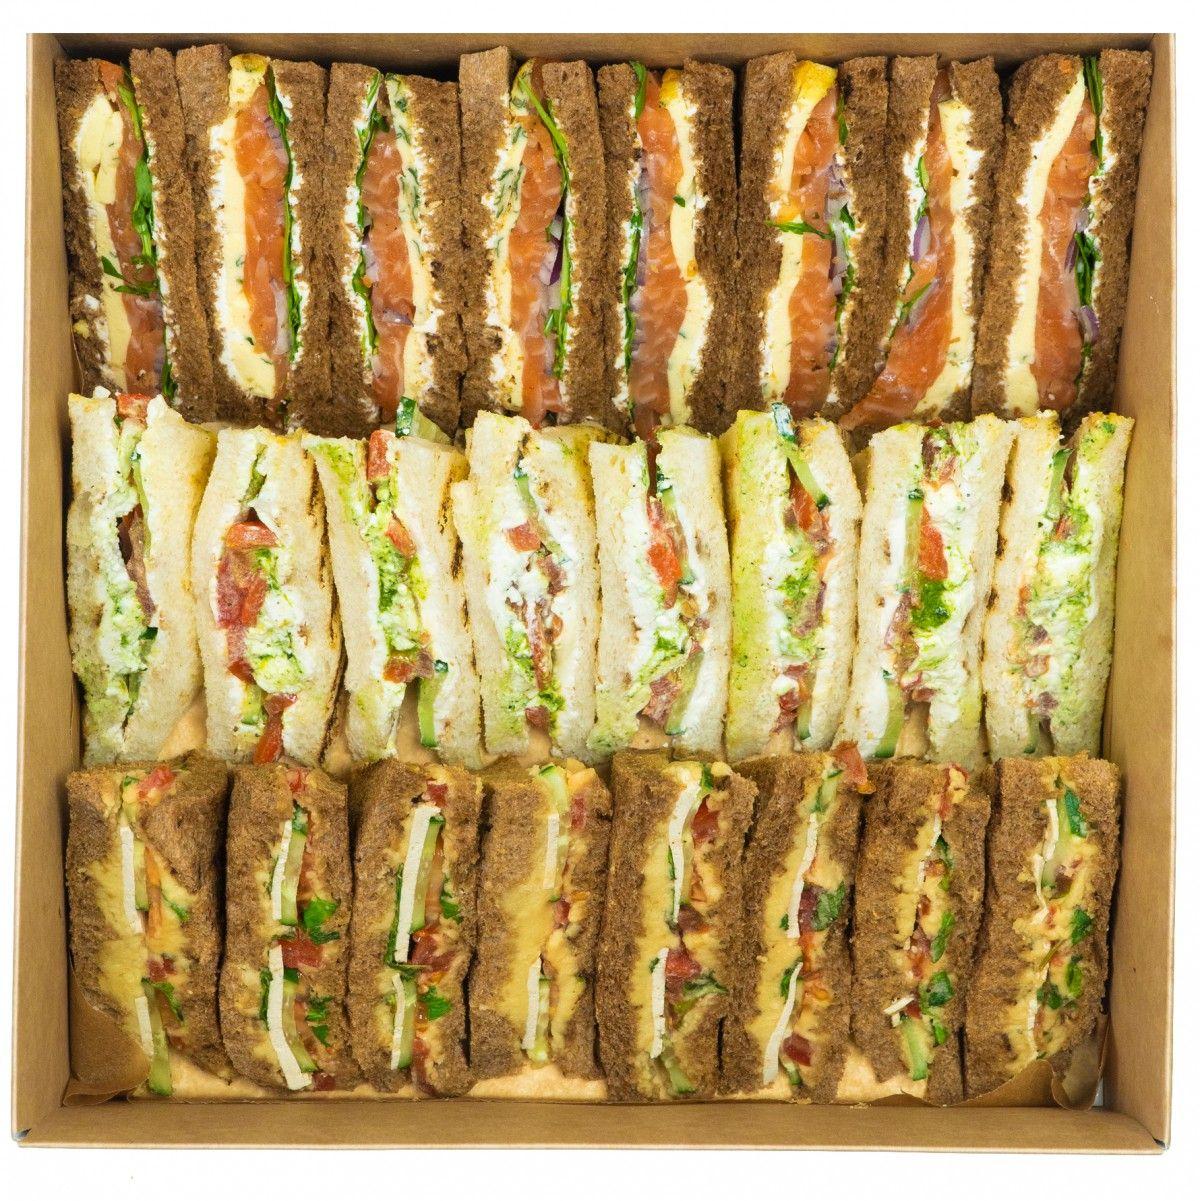 Sandwich vegetarian smart box фото 1